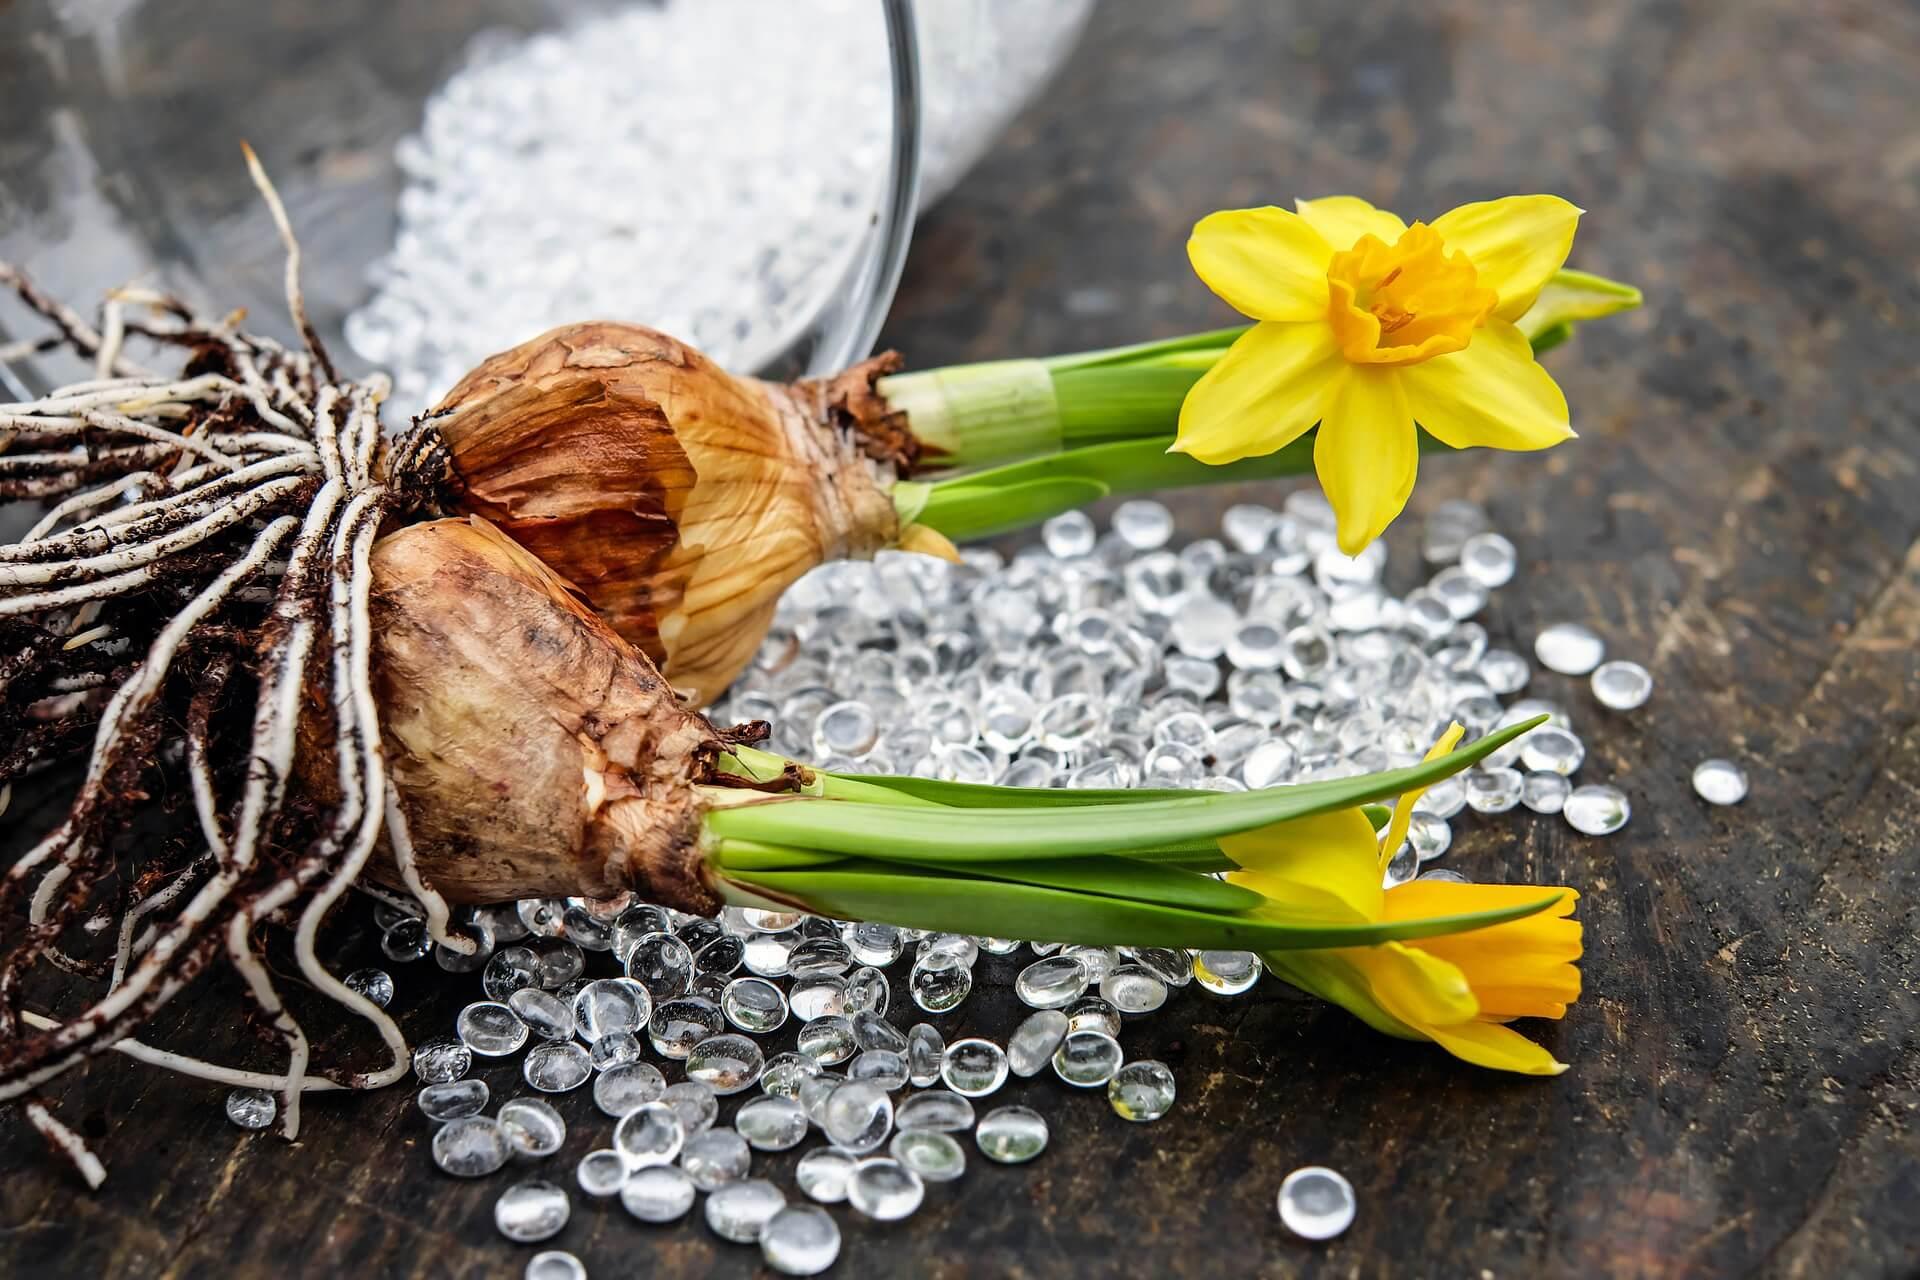 Bulbi In Vaso Di Vetro.Coltivare Bulbi Vasi Di Vetro 2 Vivaio Scariot